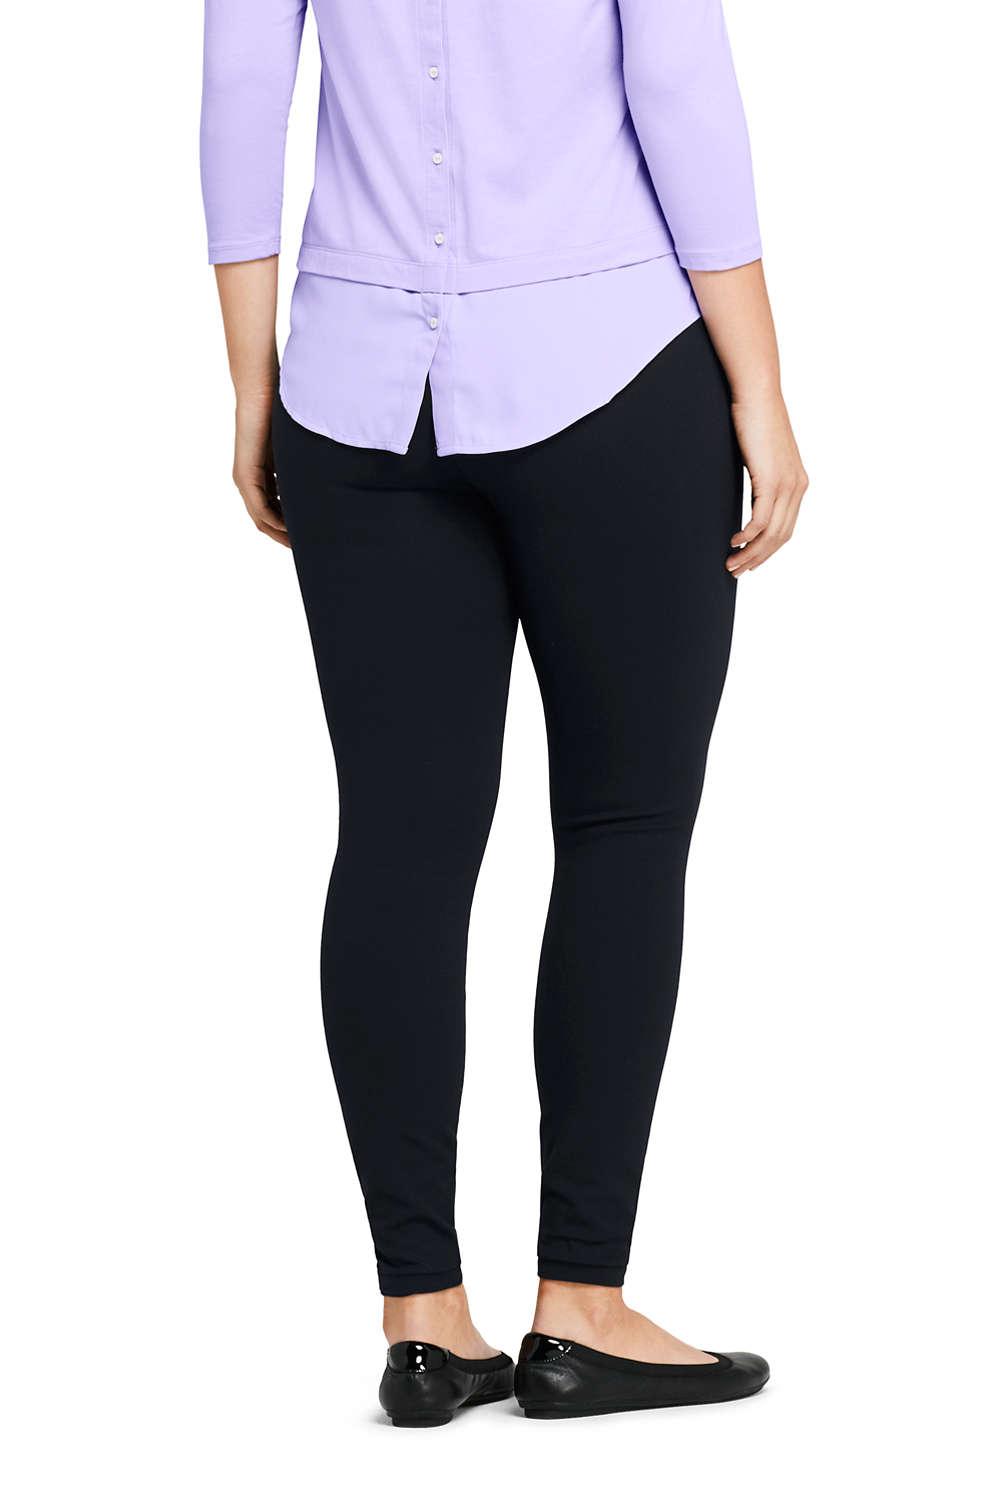 1d1662564d7 Women s Plus Size Ponte Seamless Leggings from Lands  End